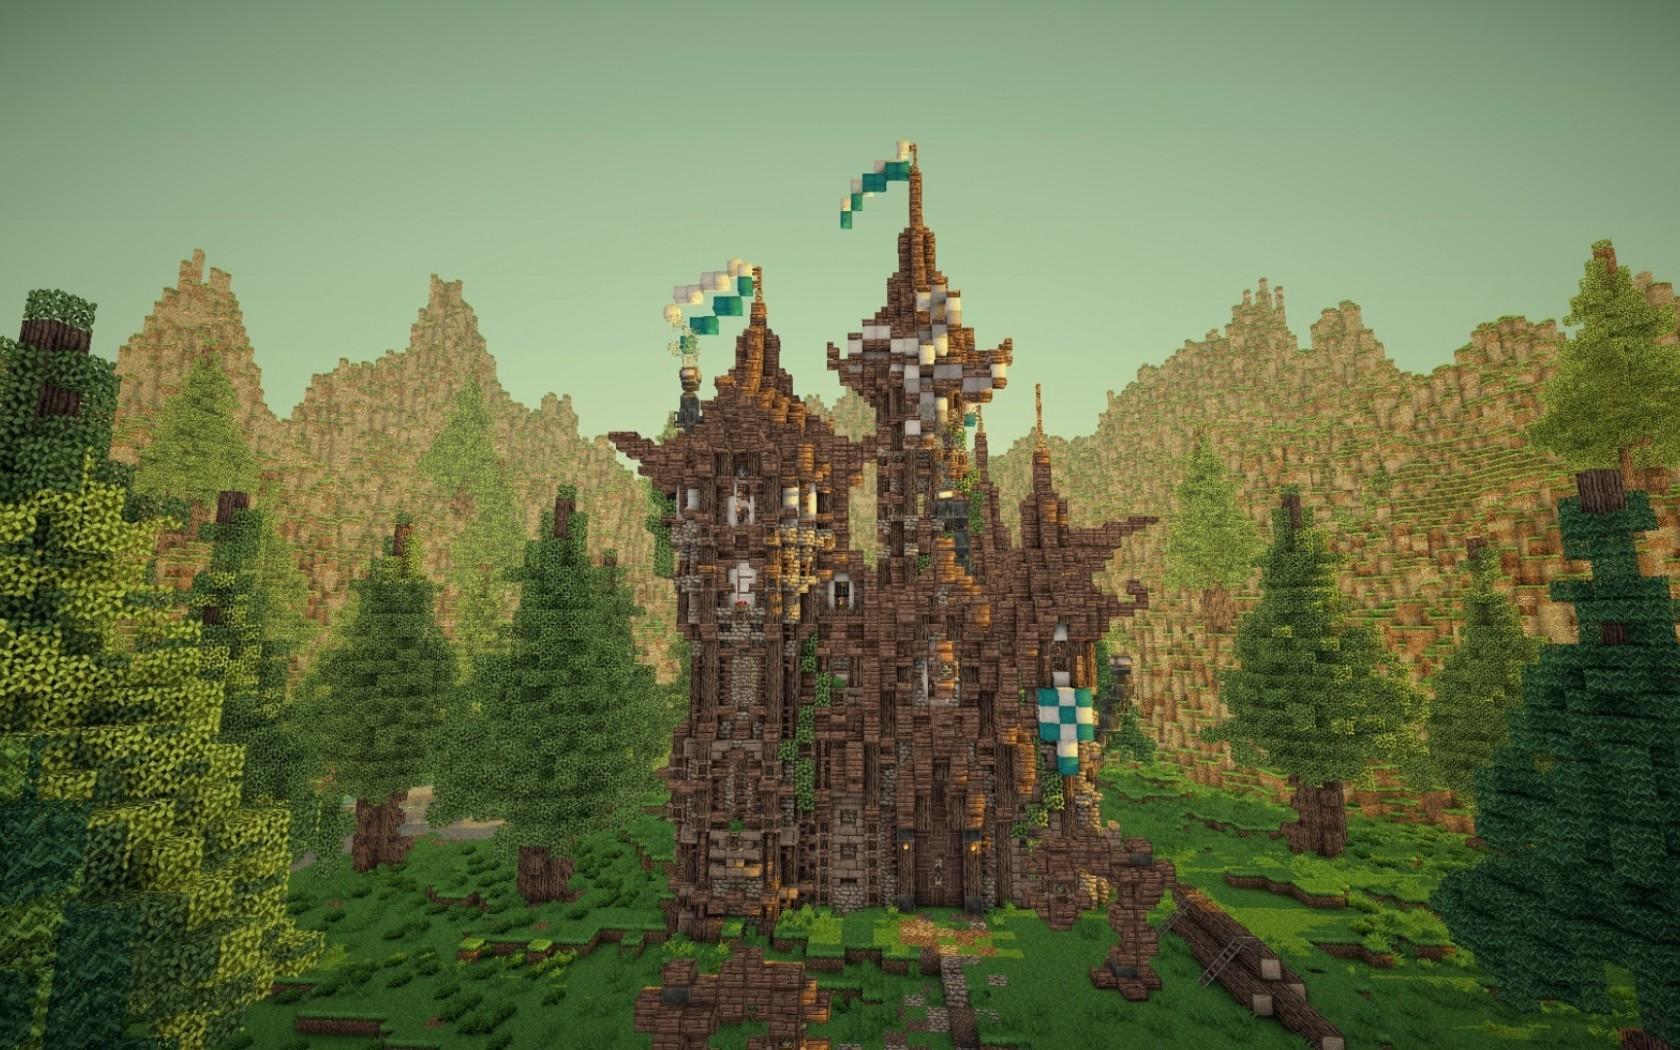 Wonderful Wallpaper Minecraft Autumn - cityscape-Minecraft-castle-chateau-tree-autumn-game-landmark-screenshot-ecosystem-biome-mojang-ab-elements-of-survival-open-world-581097  Pic_29049.jpg